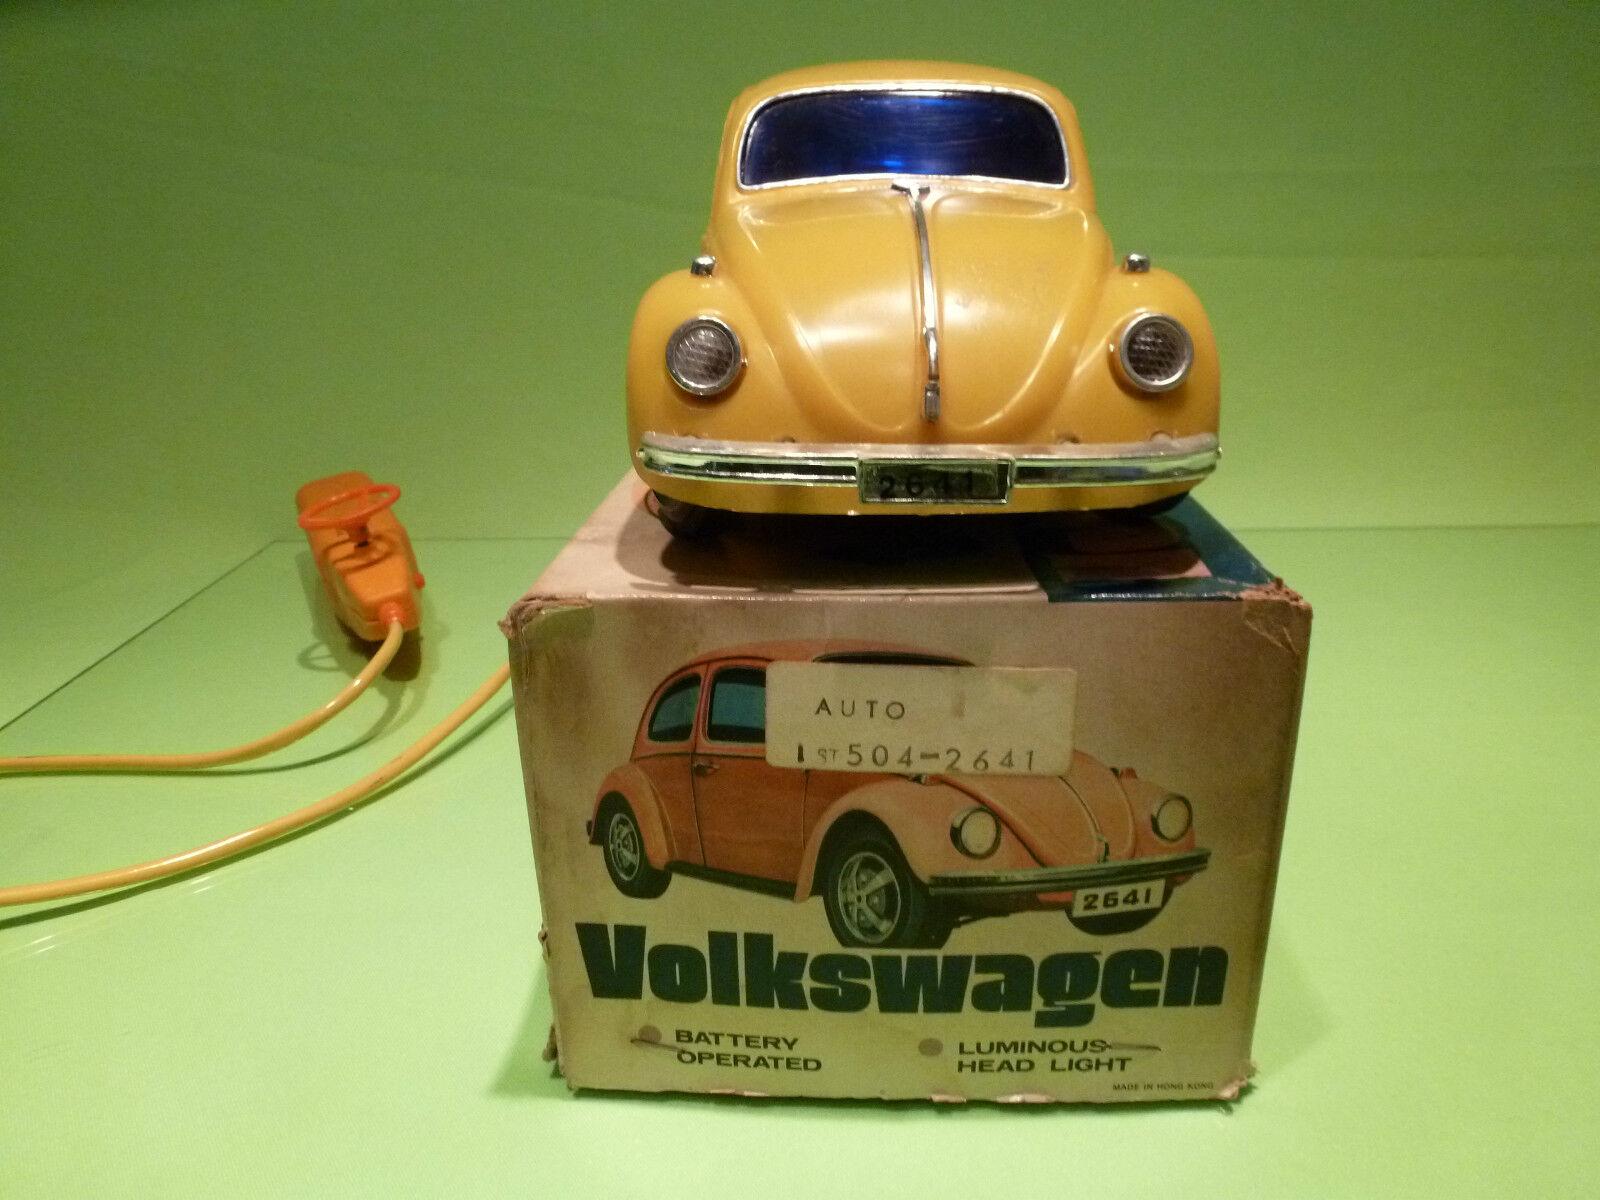 MADE IN HONG HONG HONG KONG 2641 VW VOLKSWAGEN - RC - RARE SELTEN - GOOD COND.IN BOX 825630